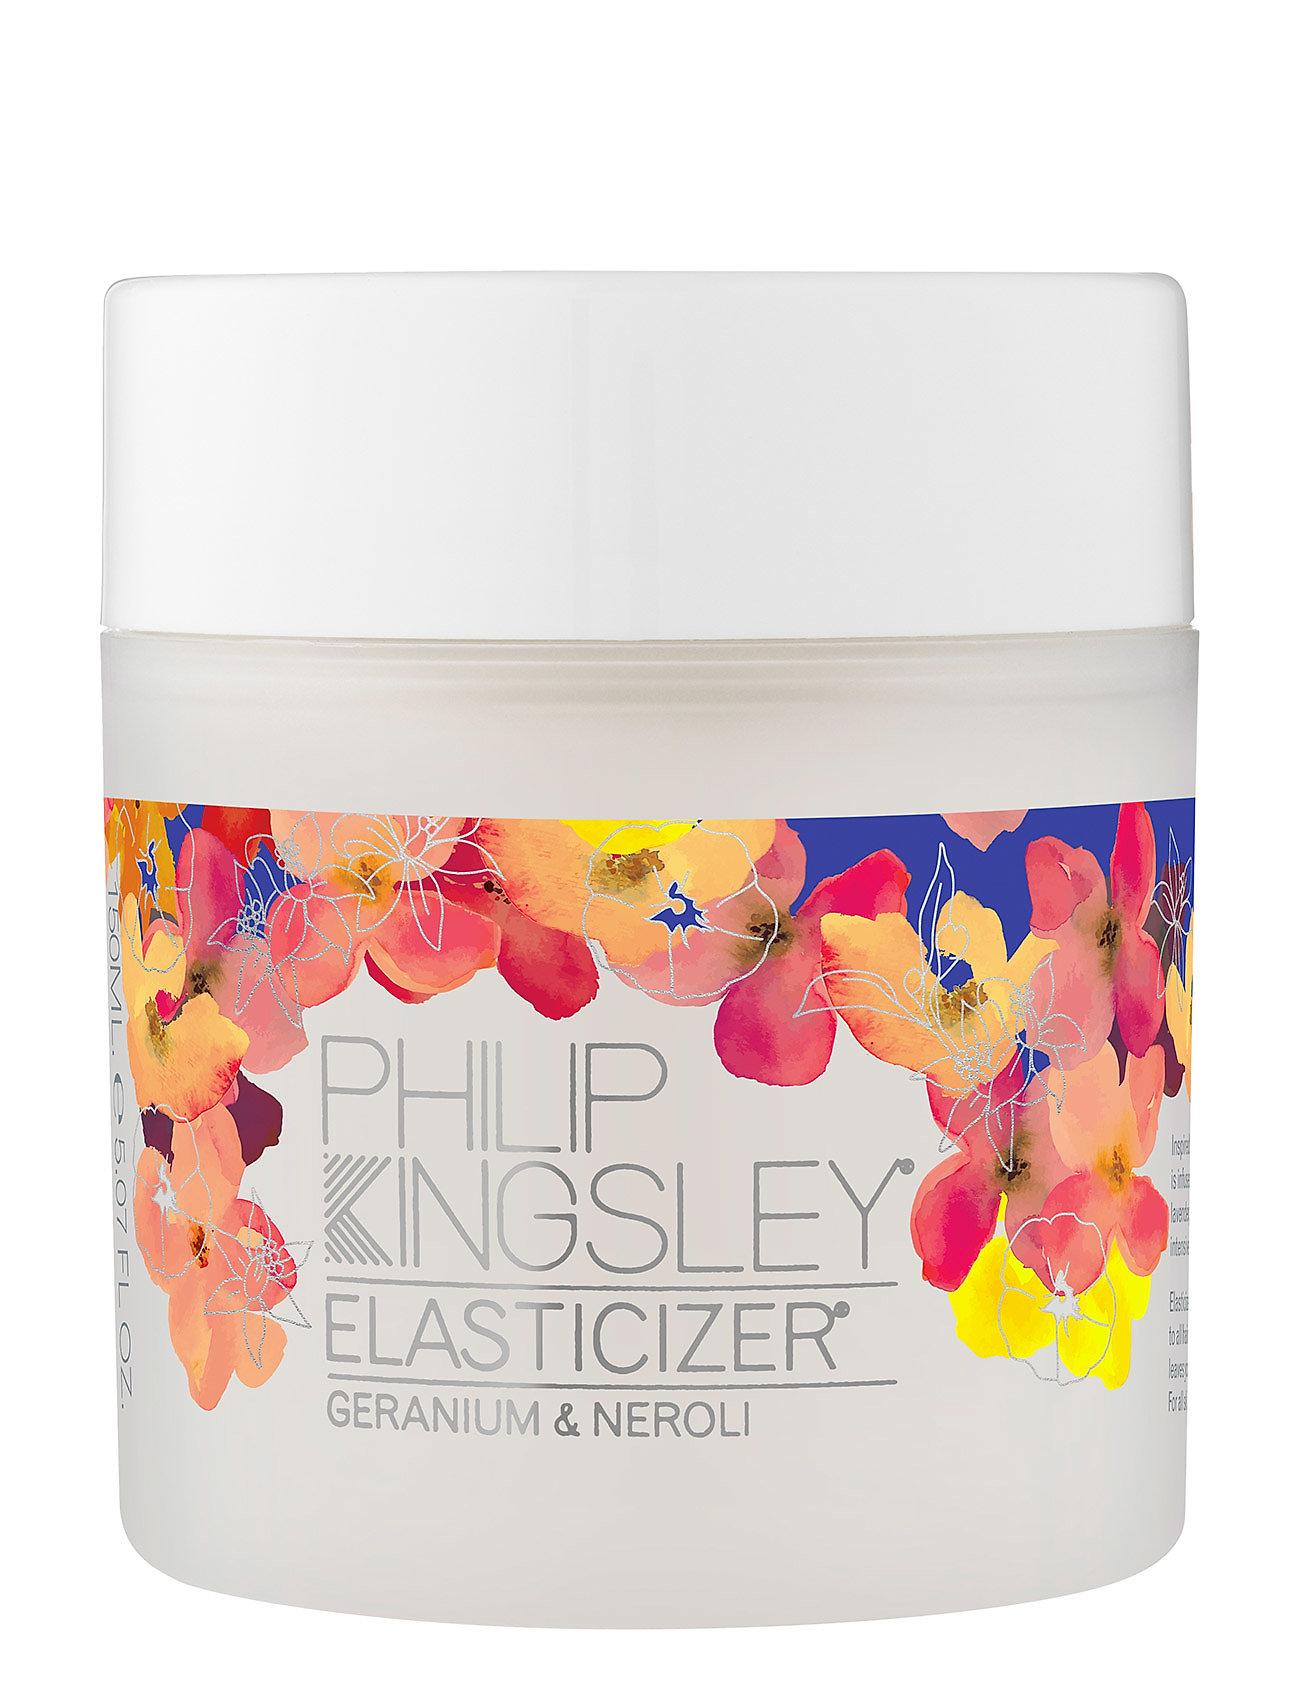 Philip Kingsley ELASTICIZER Geranium & Neroli - CLEAR